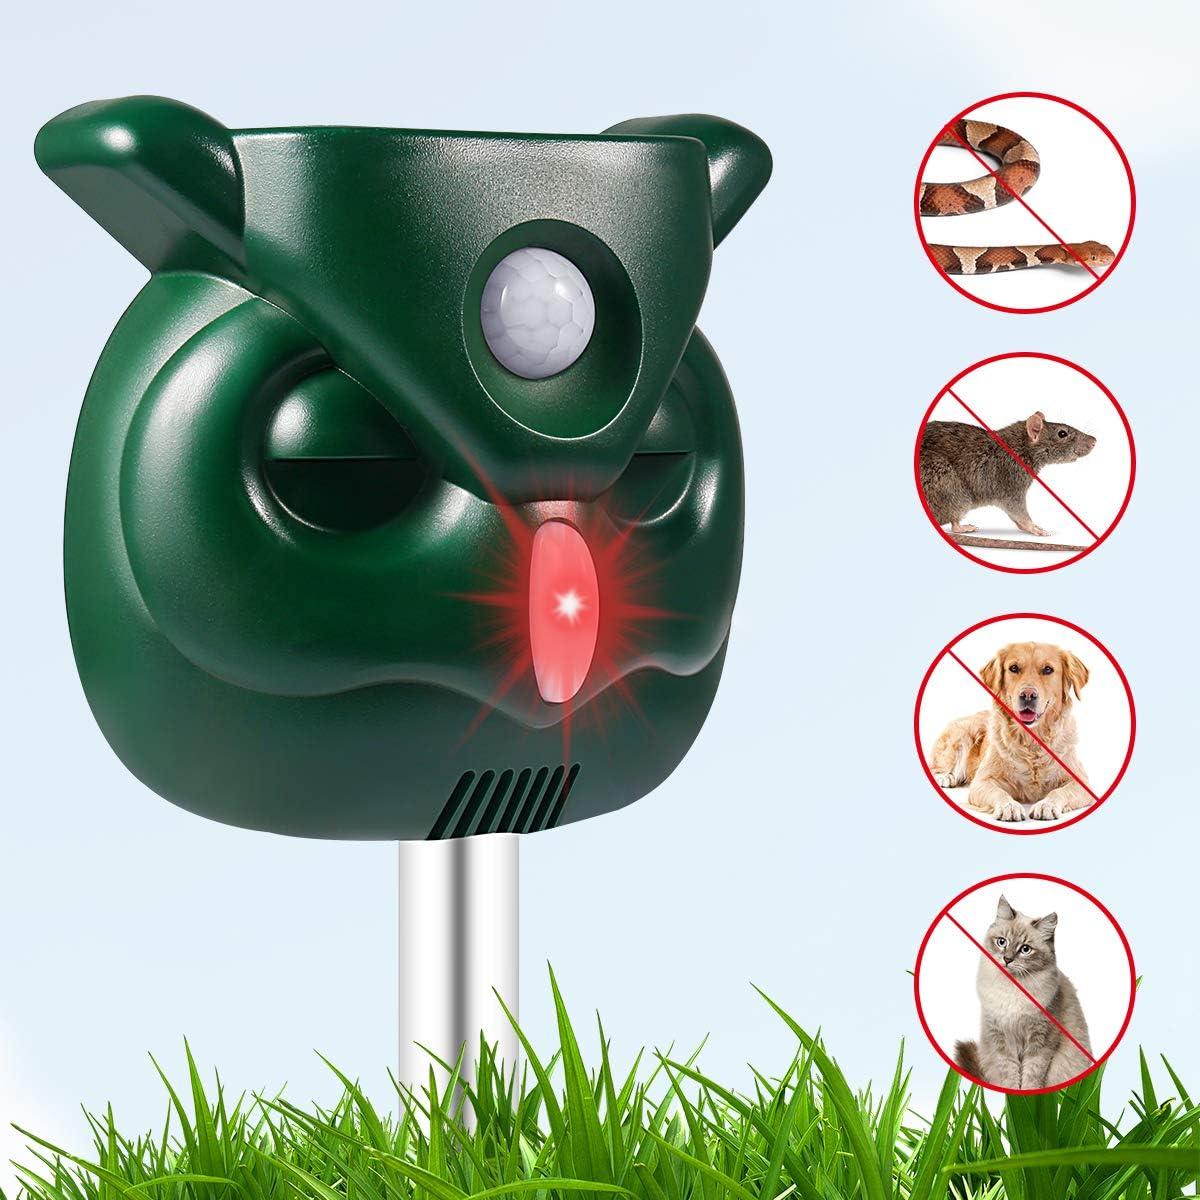 PETBROO Dog Cat Repellent, Ultrasonic Pest Repellent with Motion Sensor and Flashing Lights Outdoor Solar Powered Waterproof Farm Garden Yard Repellent, Cats, Dogs, Foxes, Birds, Skunks, Rod